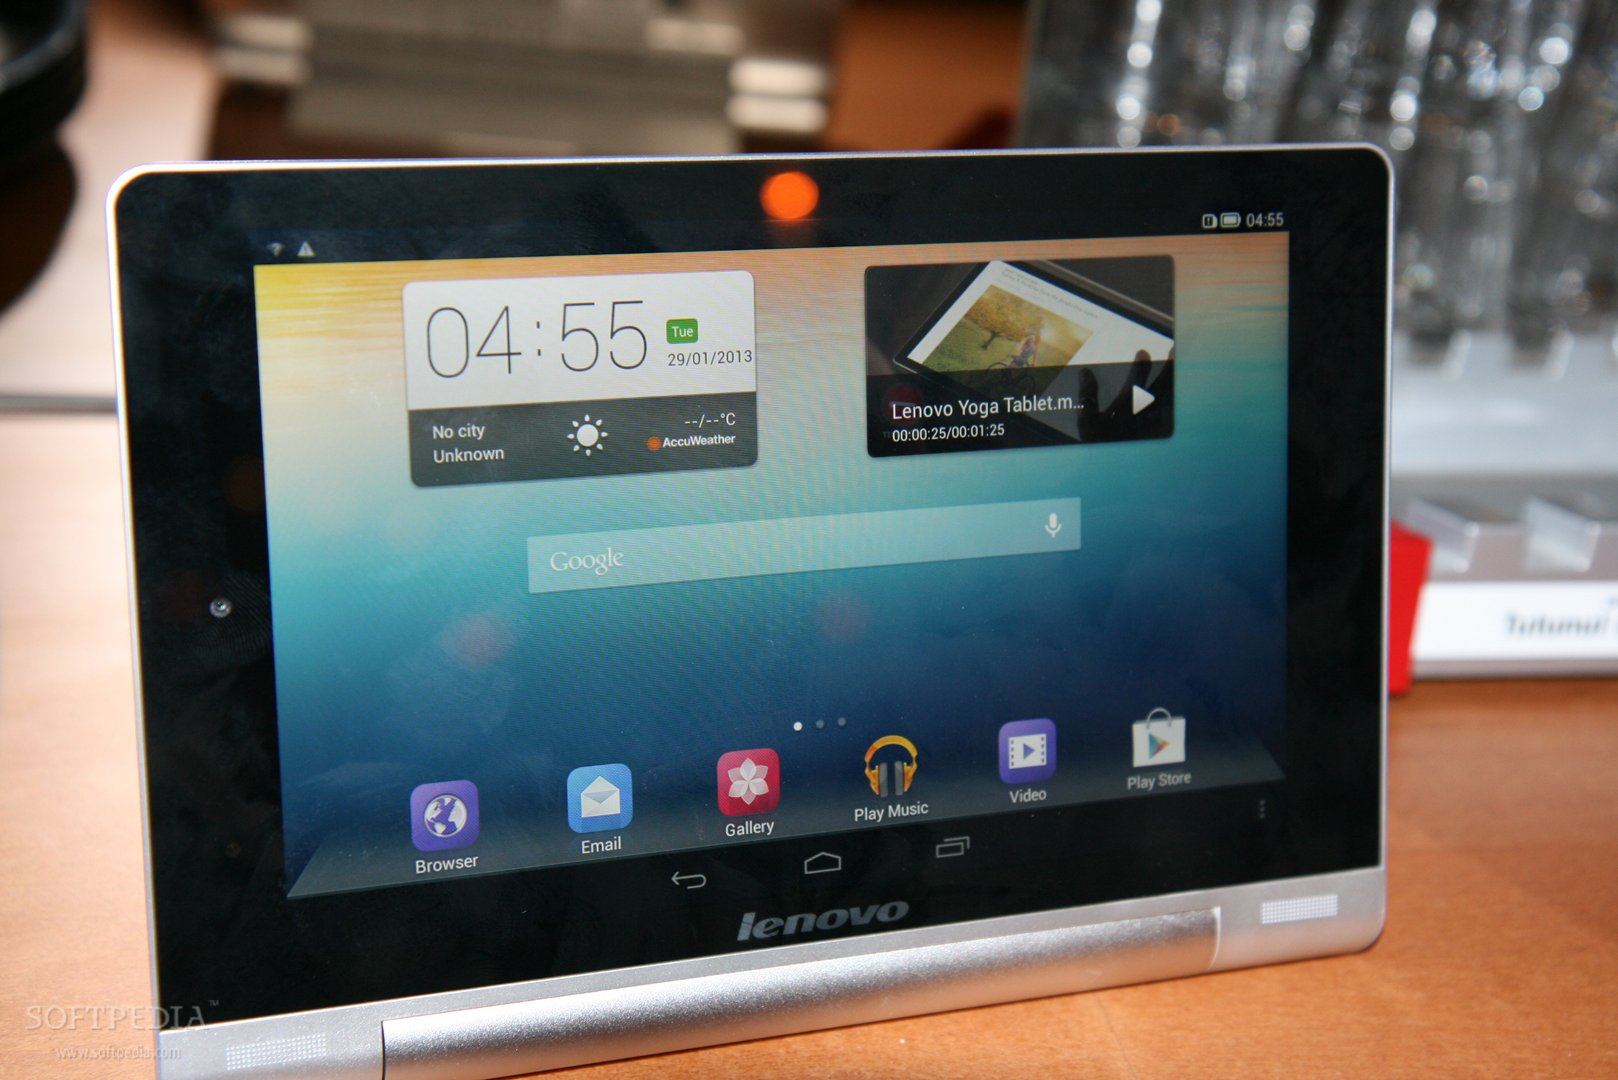 Lenovo Yoga Tablet Hands On Photo Gallery Softpedia